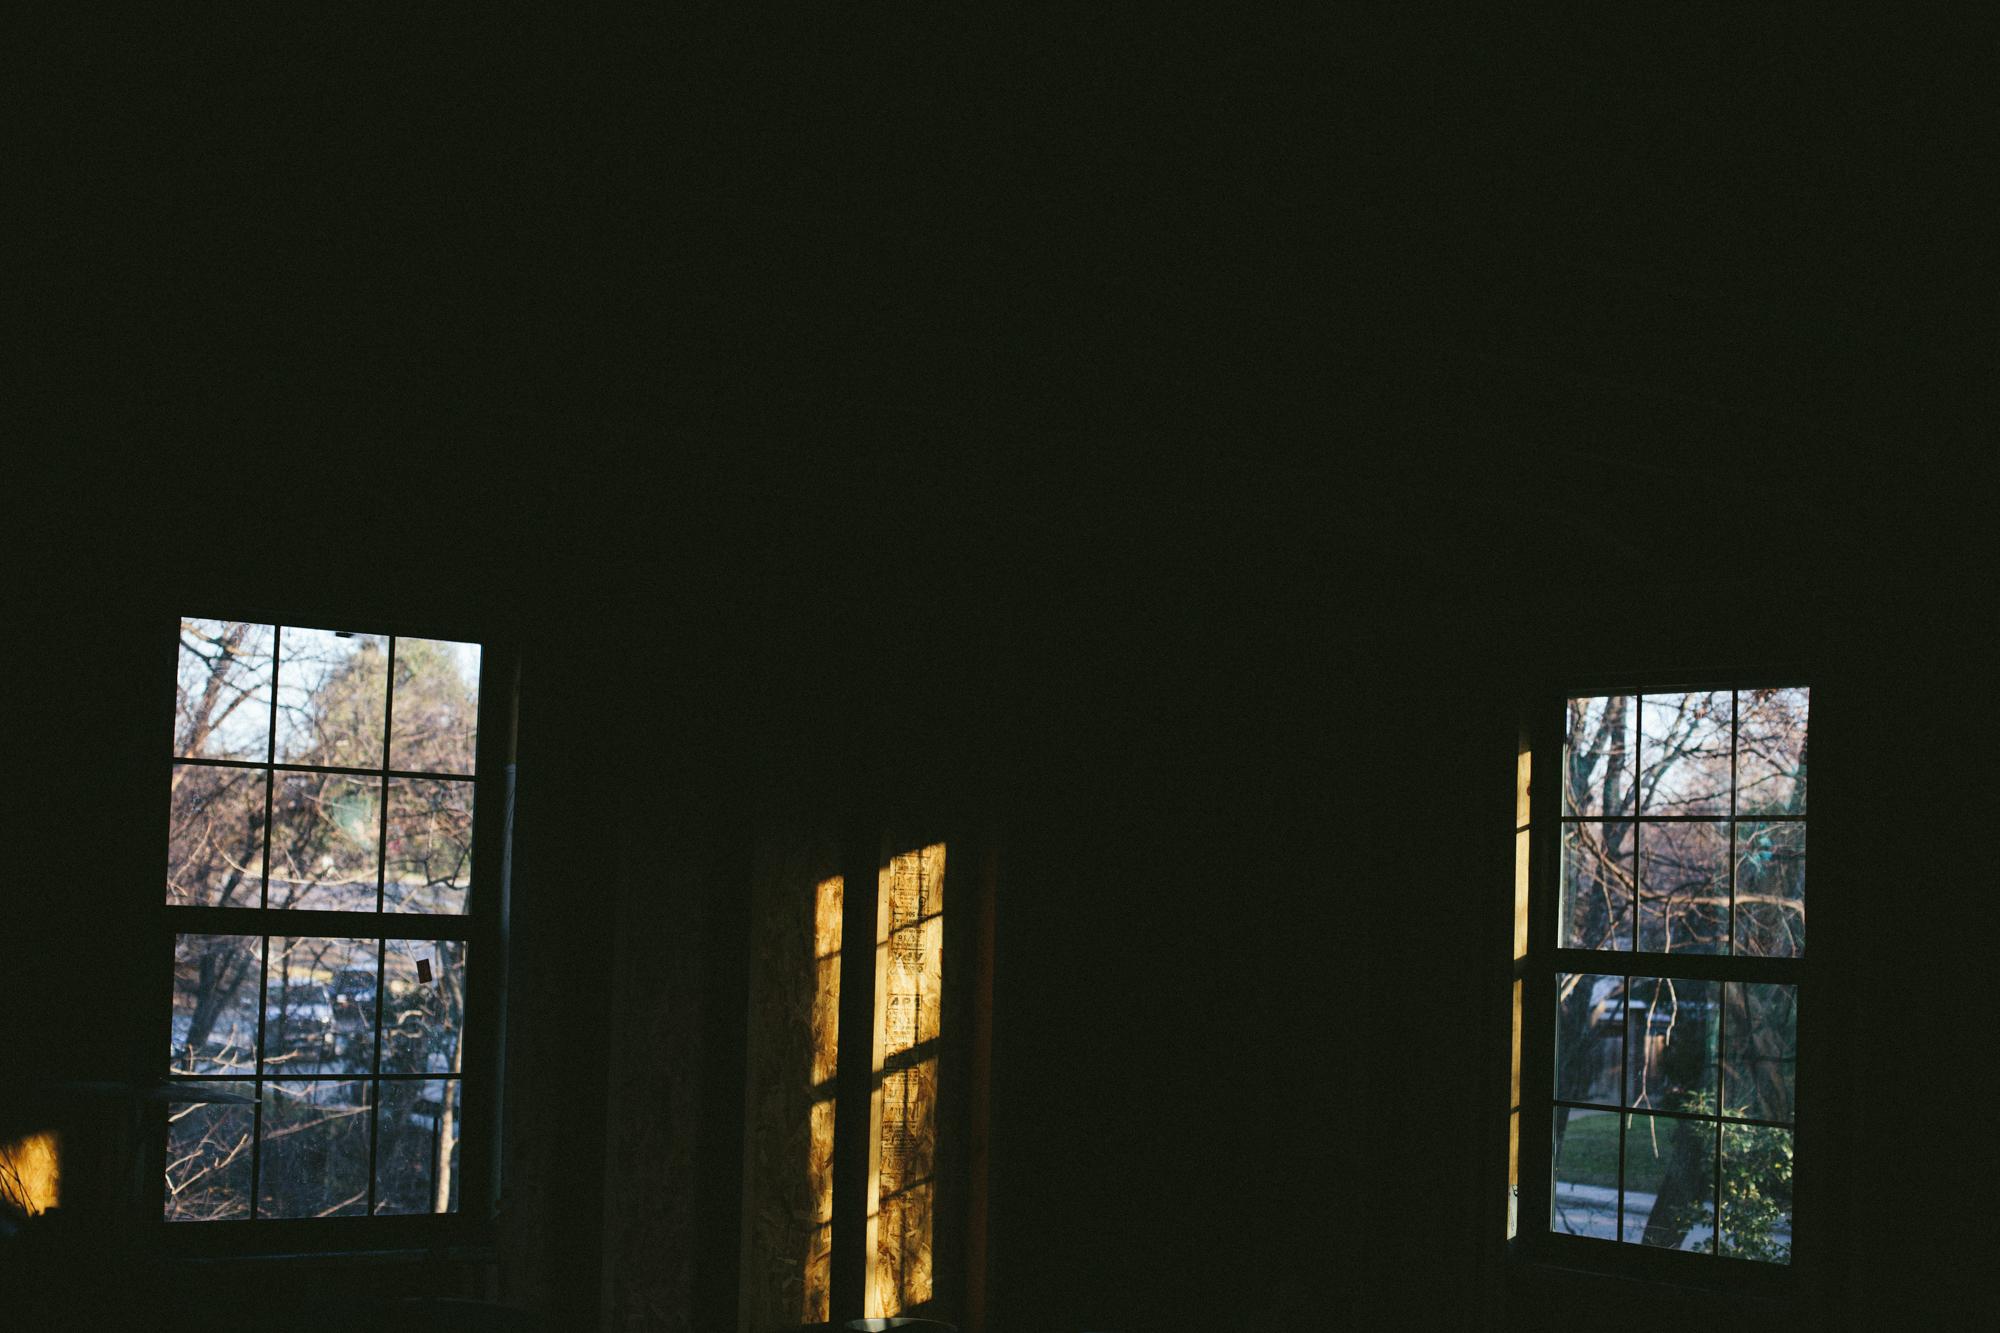 windows_elizabethbristol.jpg